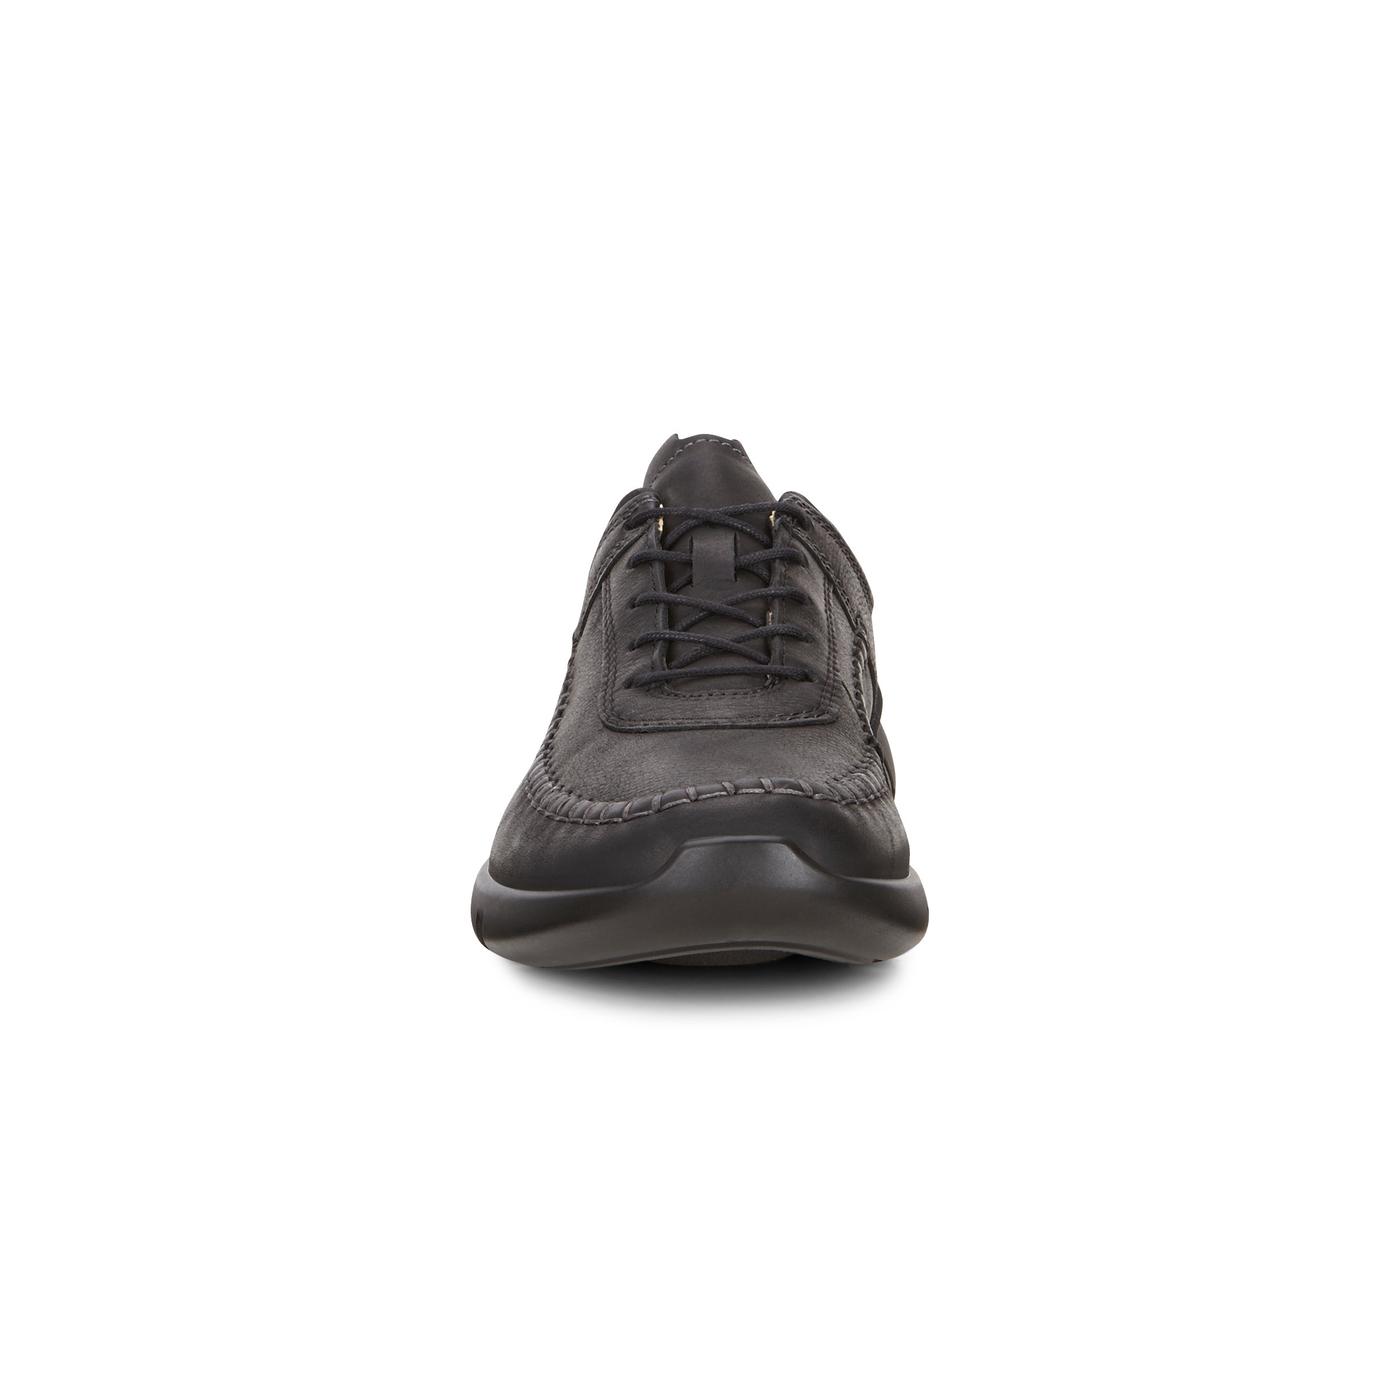 6209e65707 ECCO Cross X Classic Tie | Men's Shoes | ECCO® Shoes